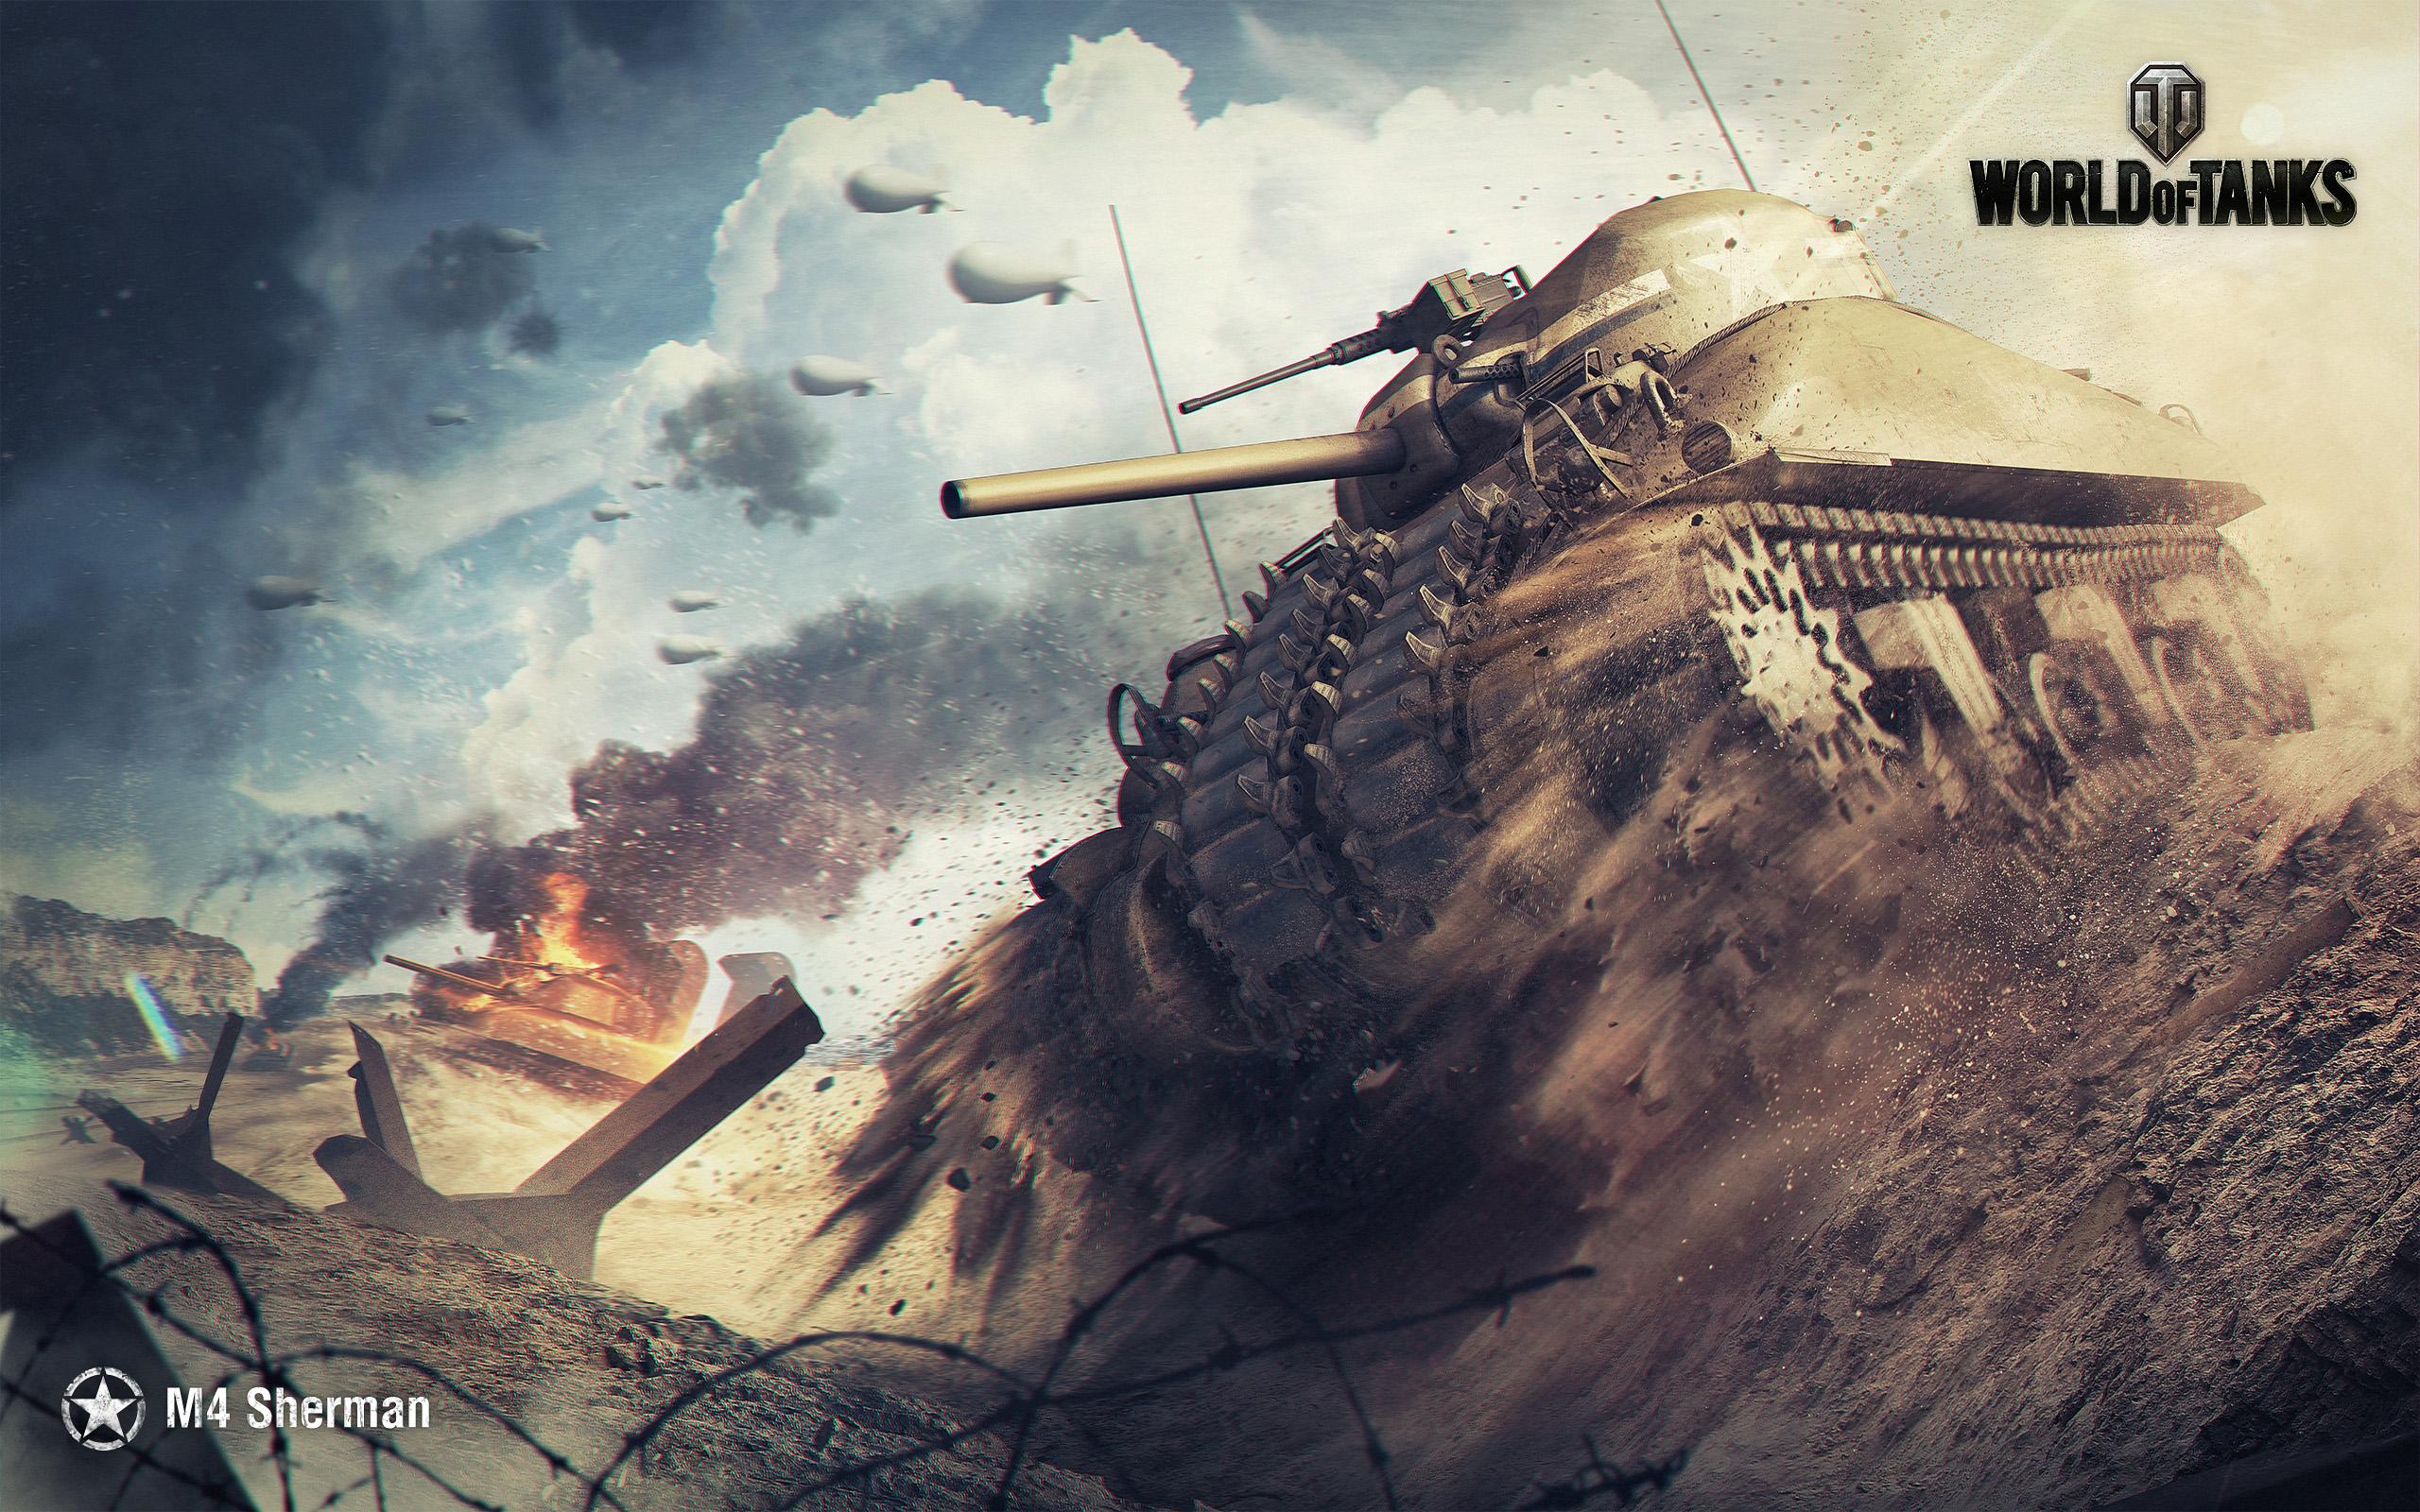 HD Wallpapers M4 Sherman World of Tanks